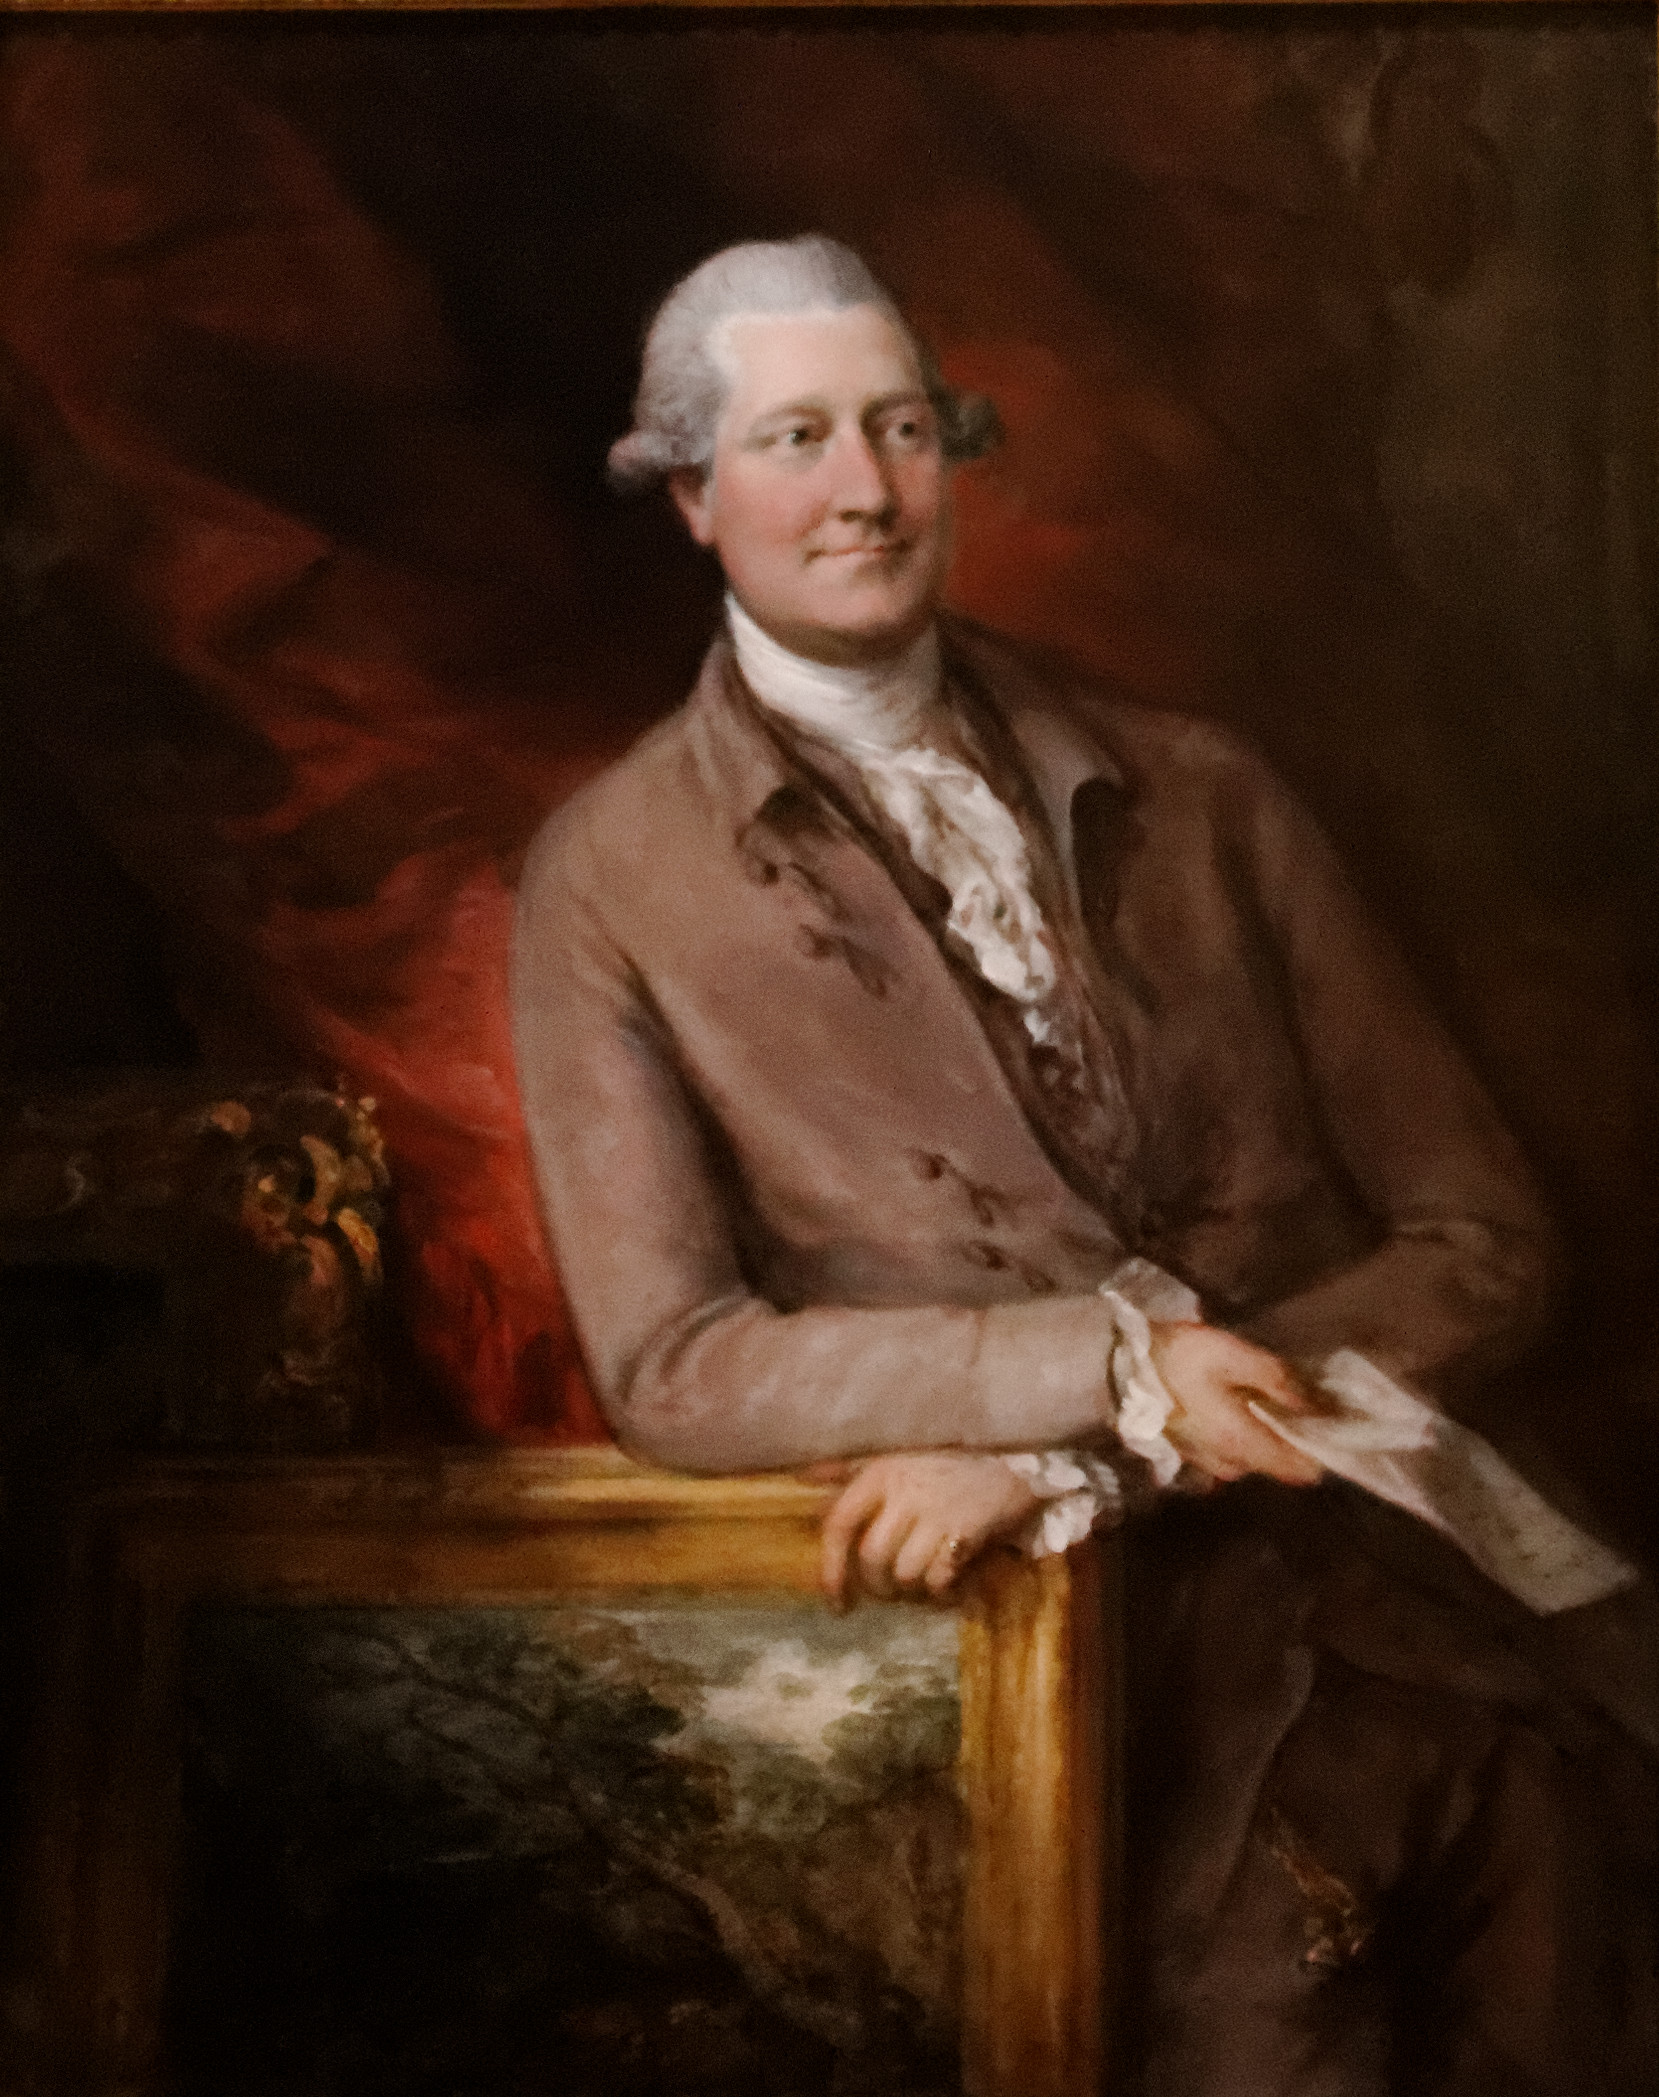 Thomas_Gainsborough_-_Portrait_of_James_Christie